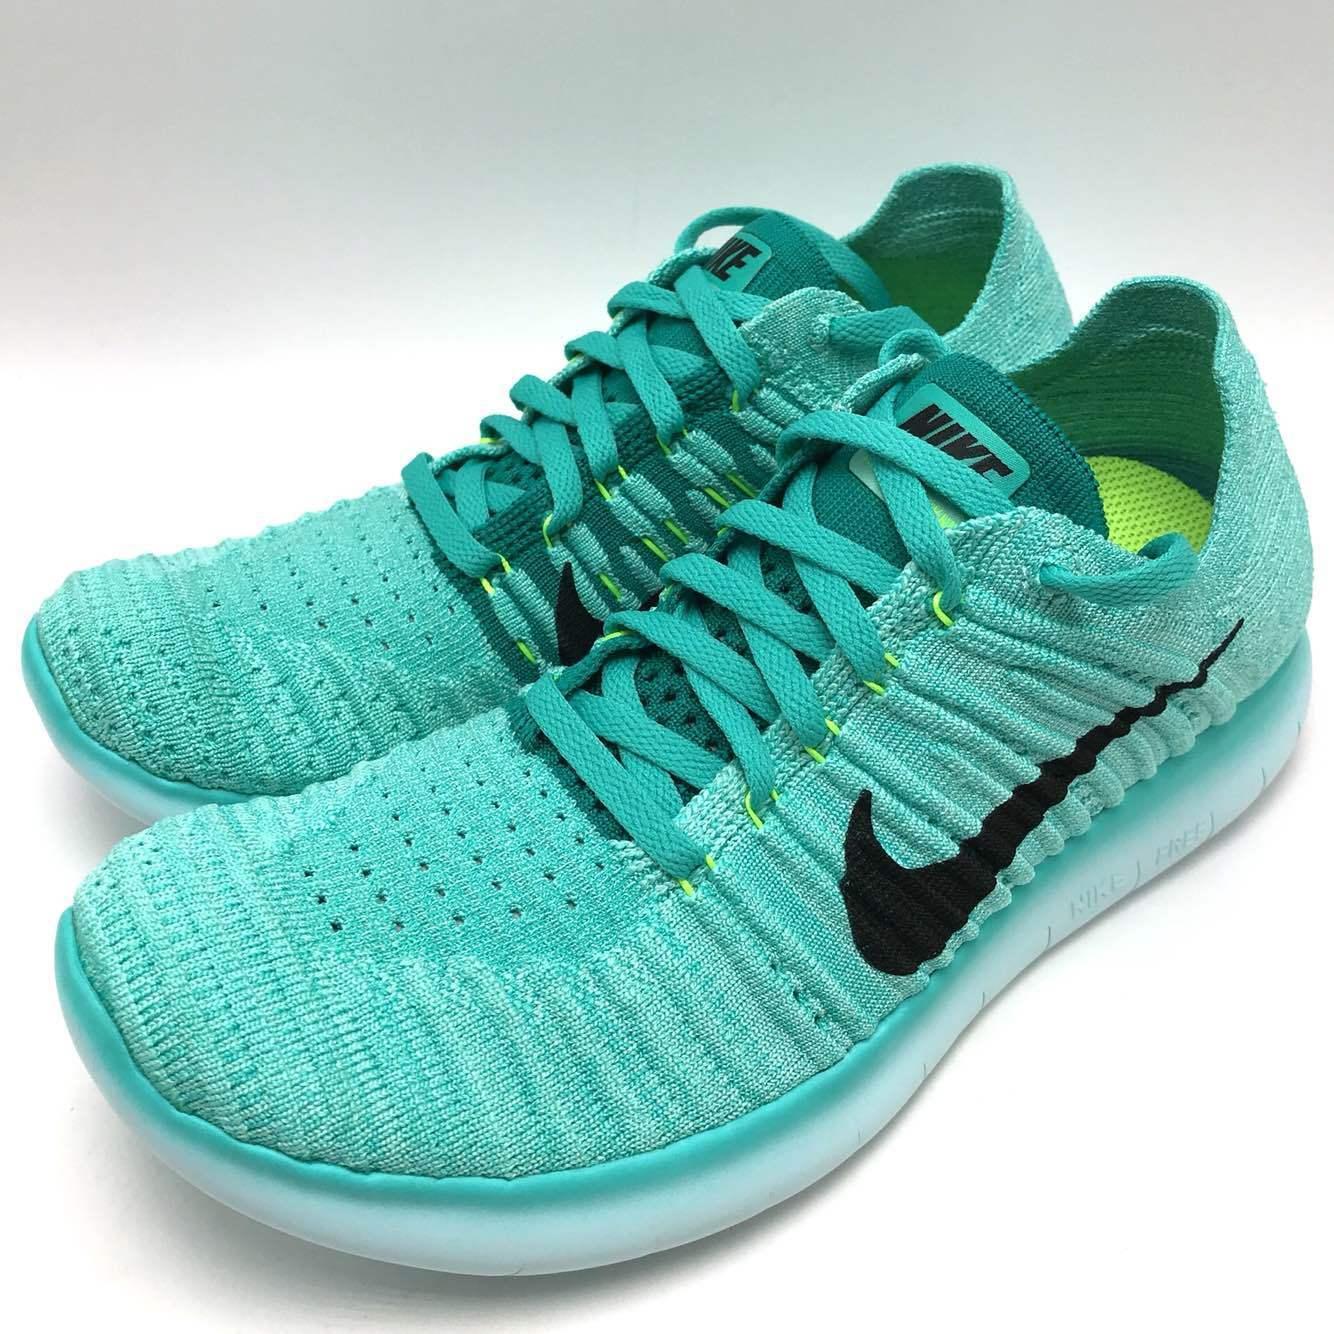 Nike Free RN Flyknit Women's Running  Hyper Turq Black-Volt-Rio Teal 831070-307